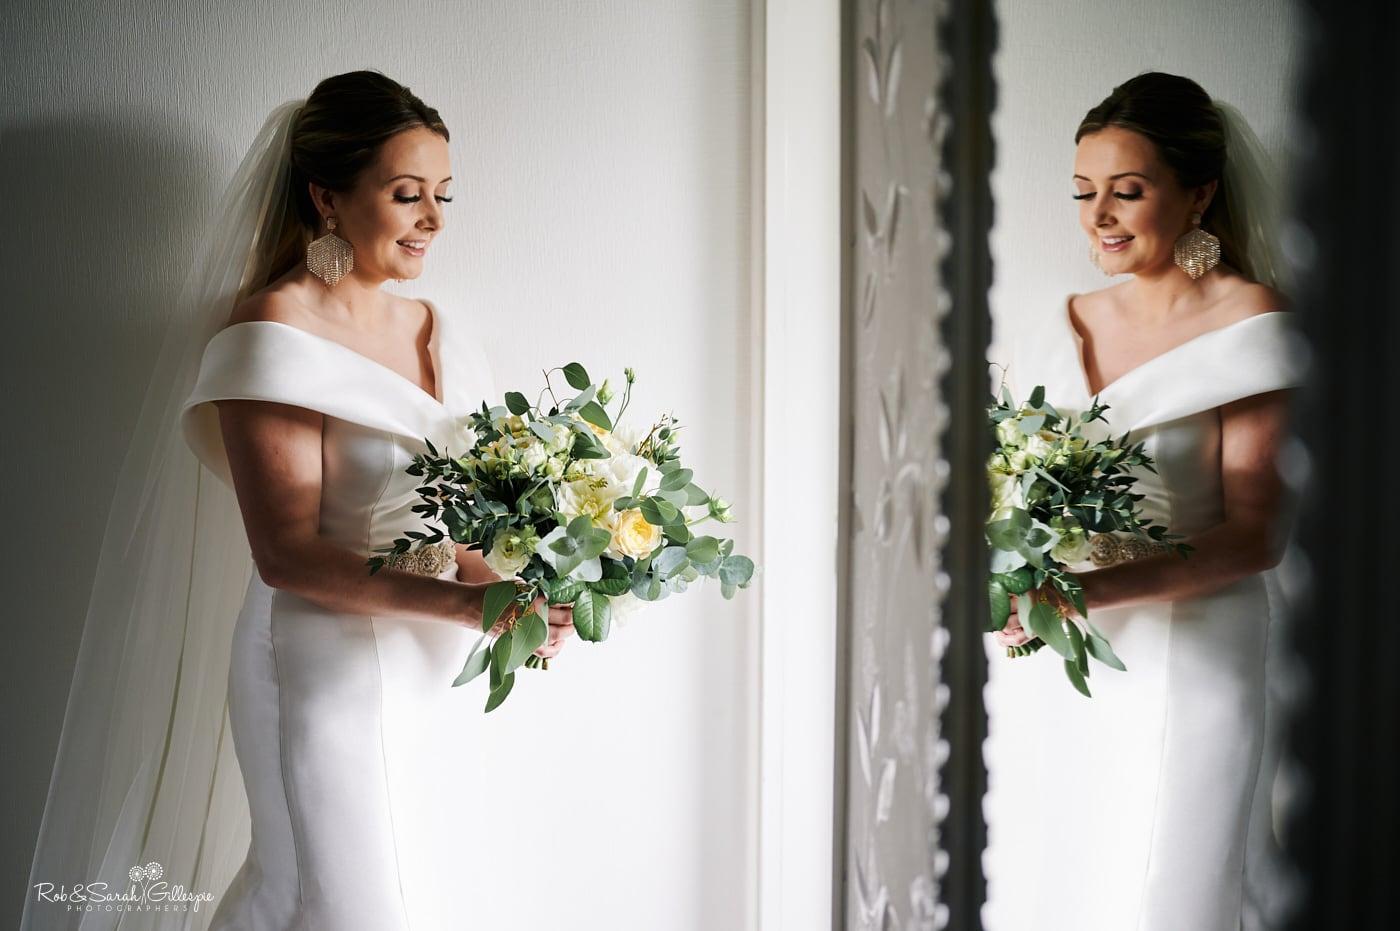 Beautiful portrait of bride in mirror holding bouquet